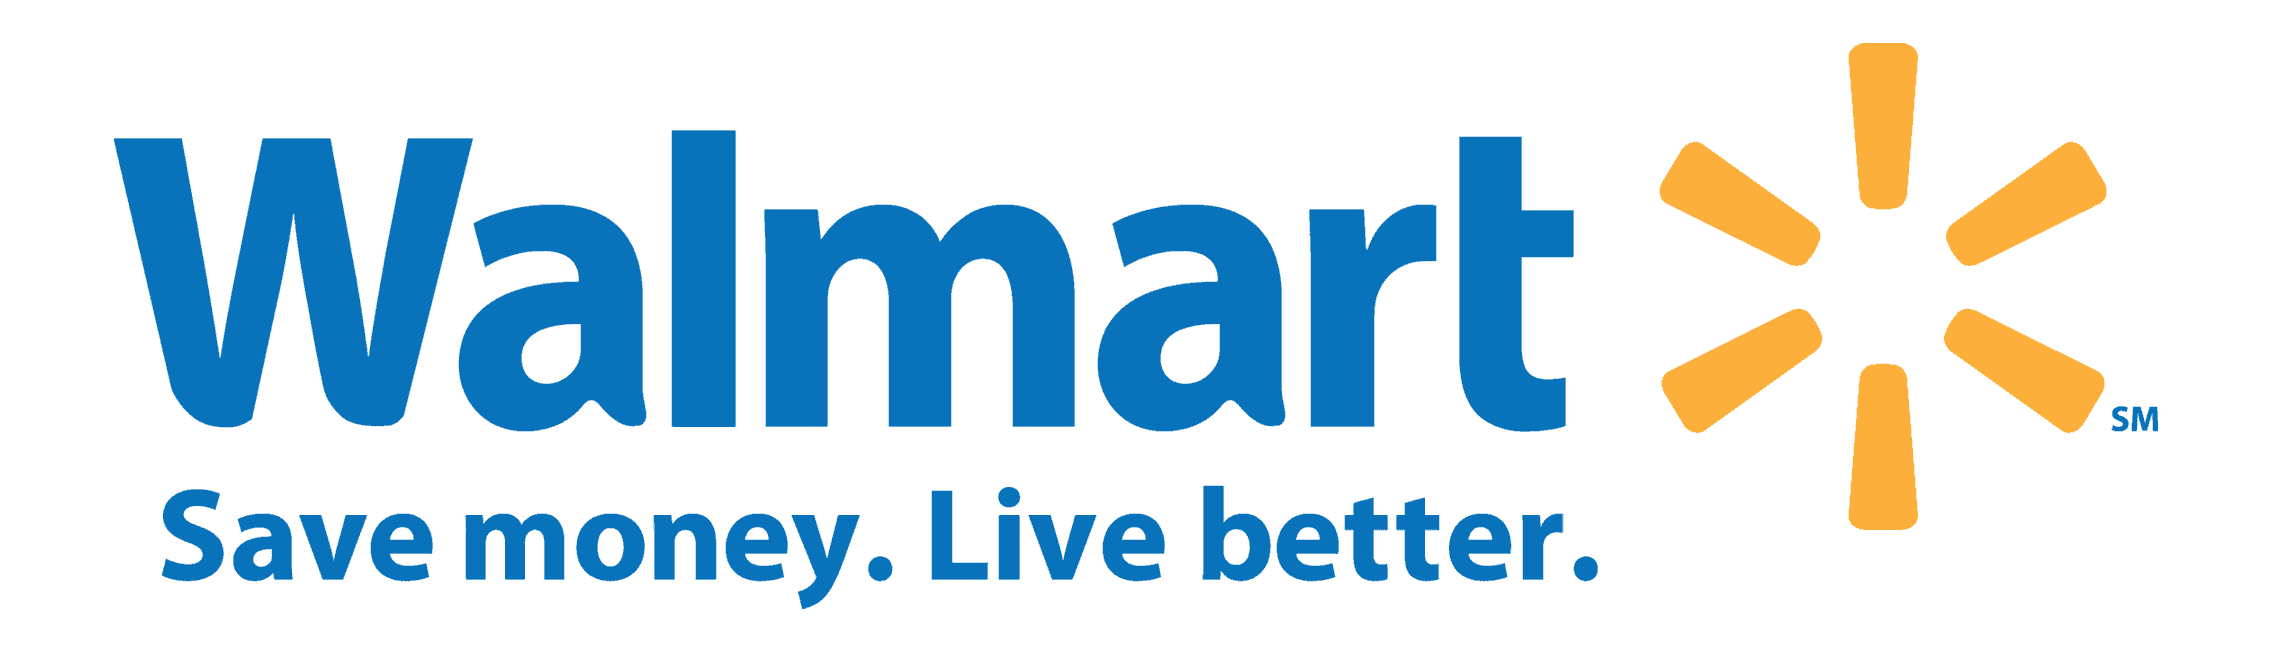 walmart solutions